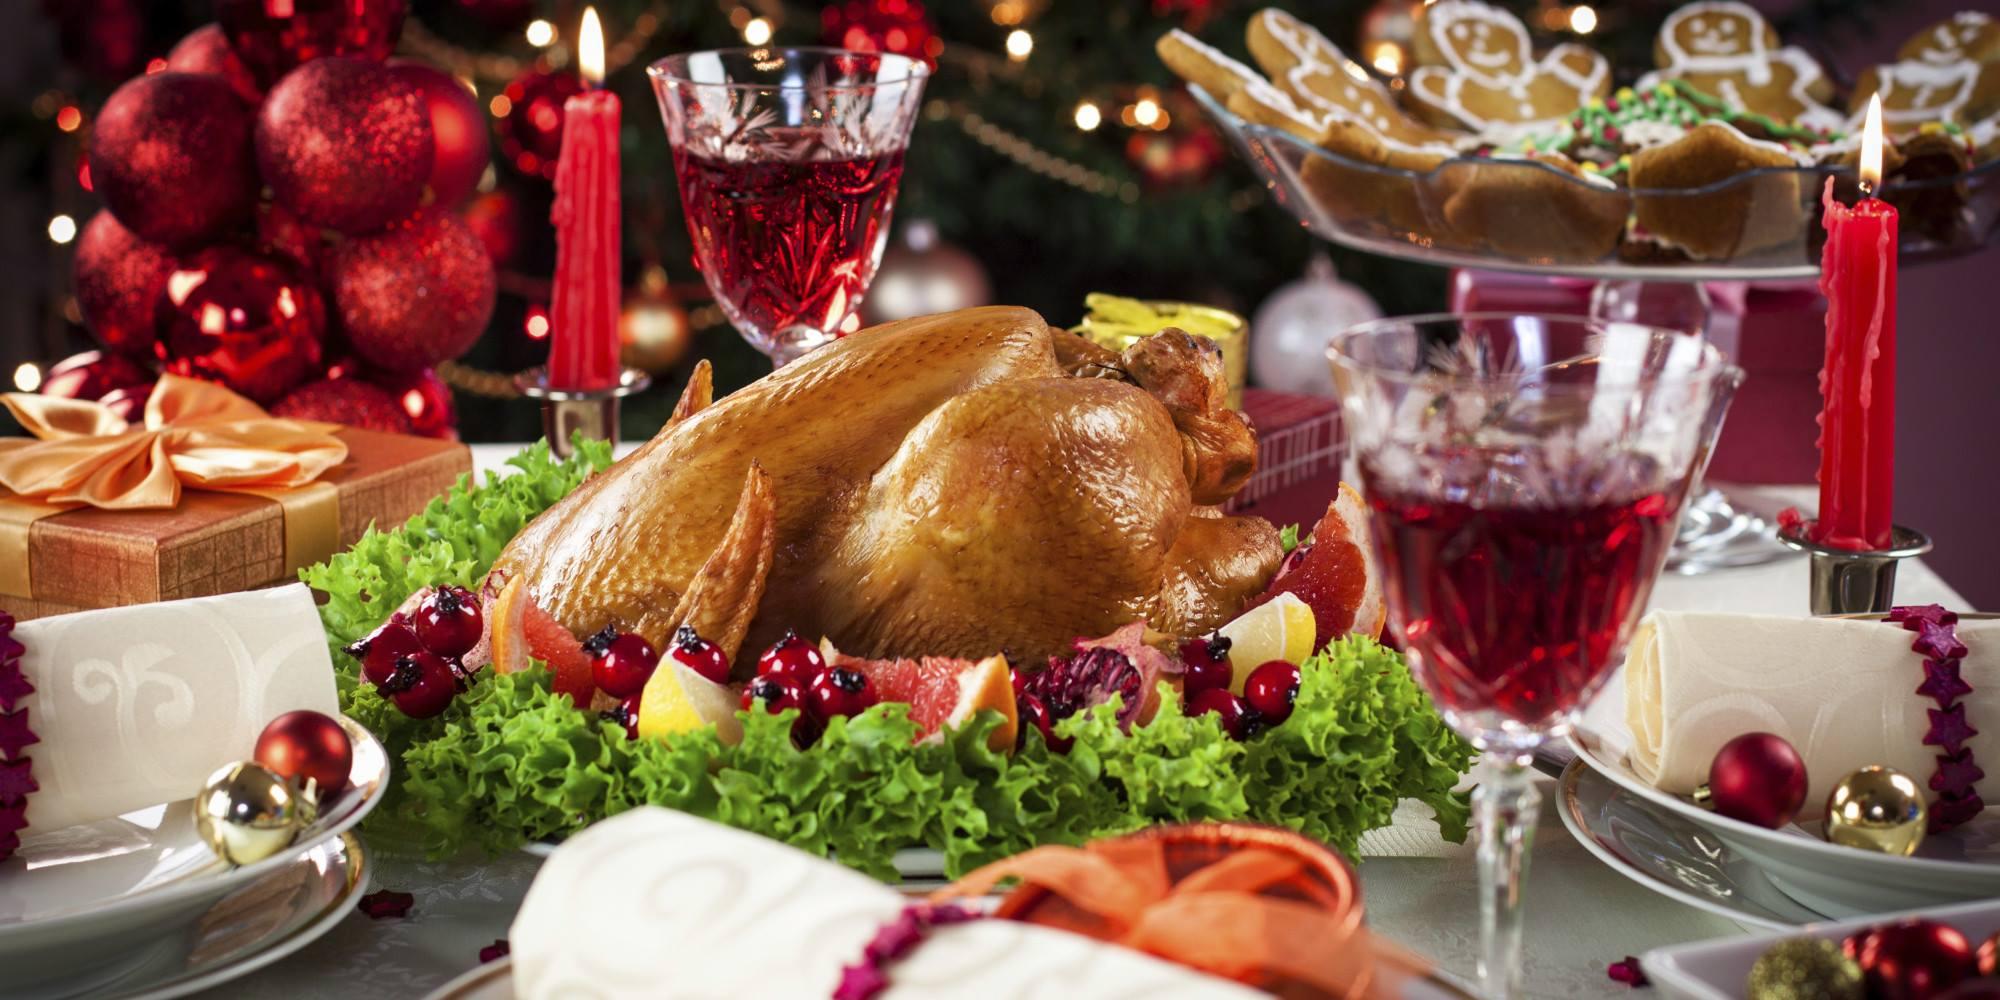 Christmas Dinner with turkey